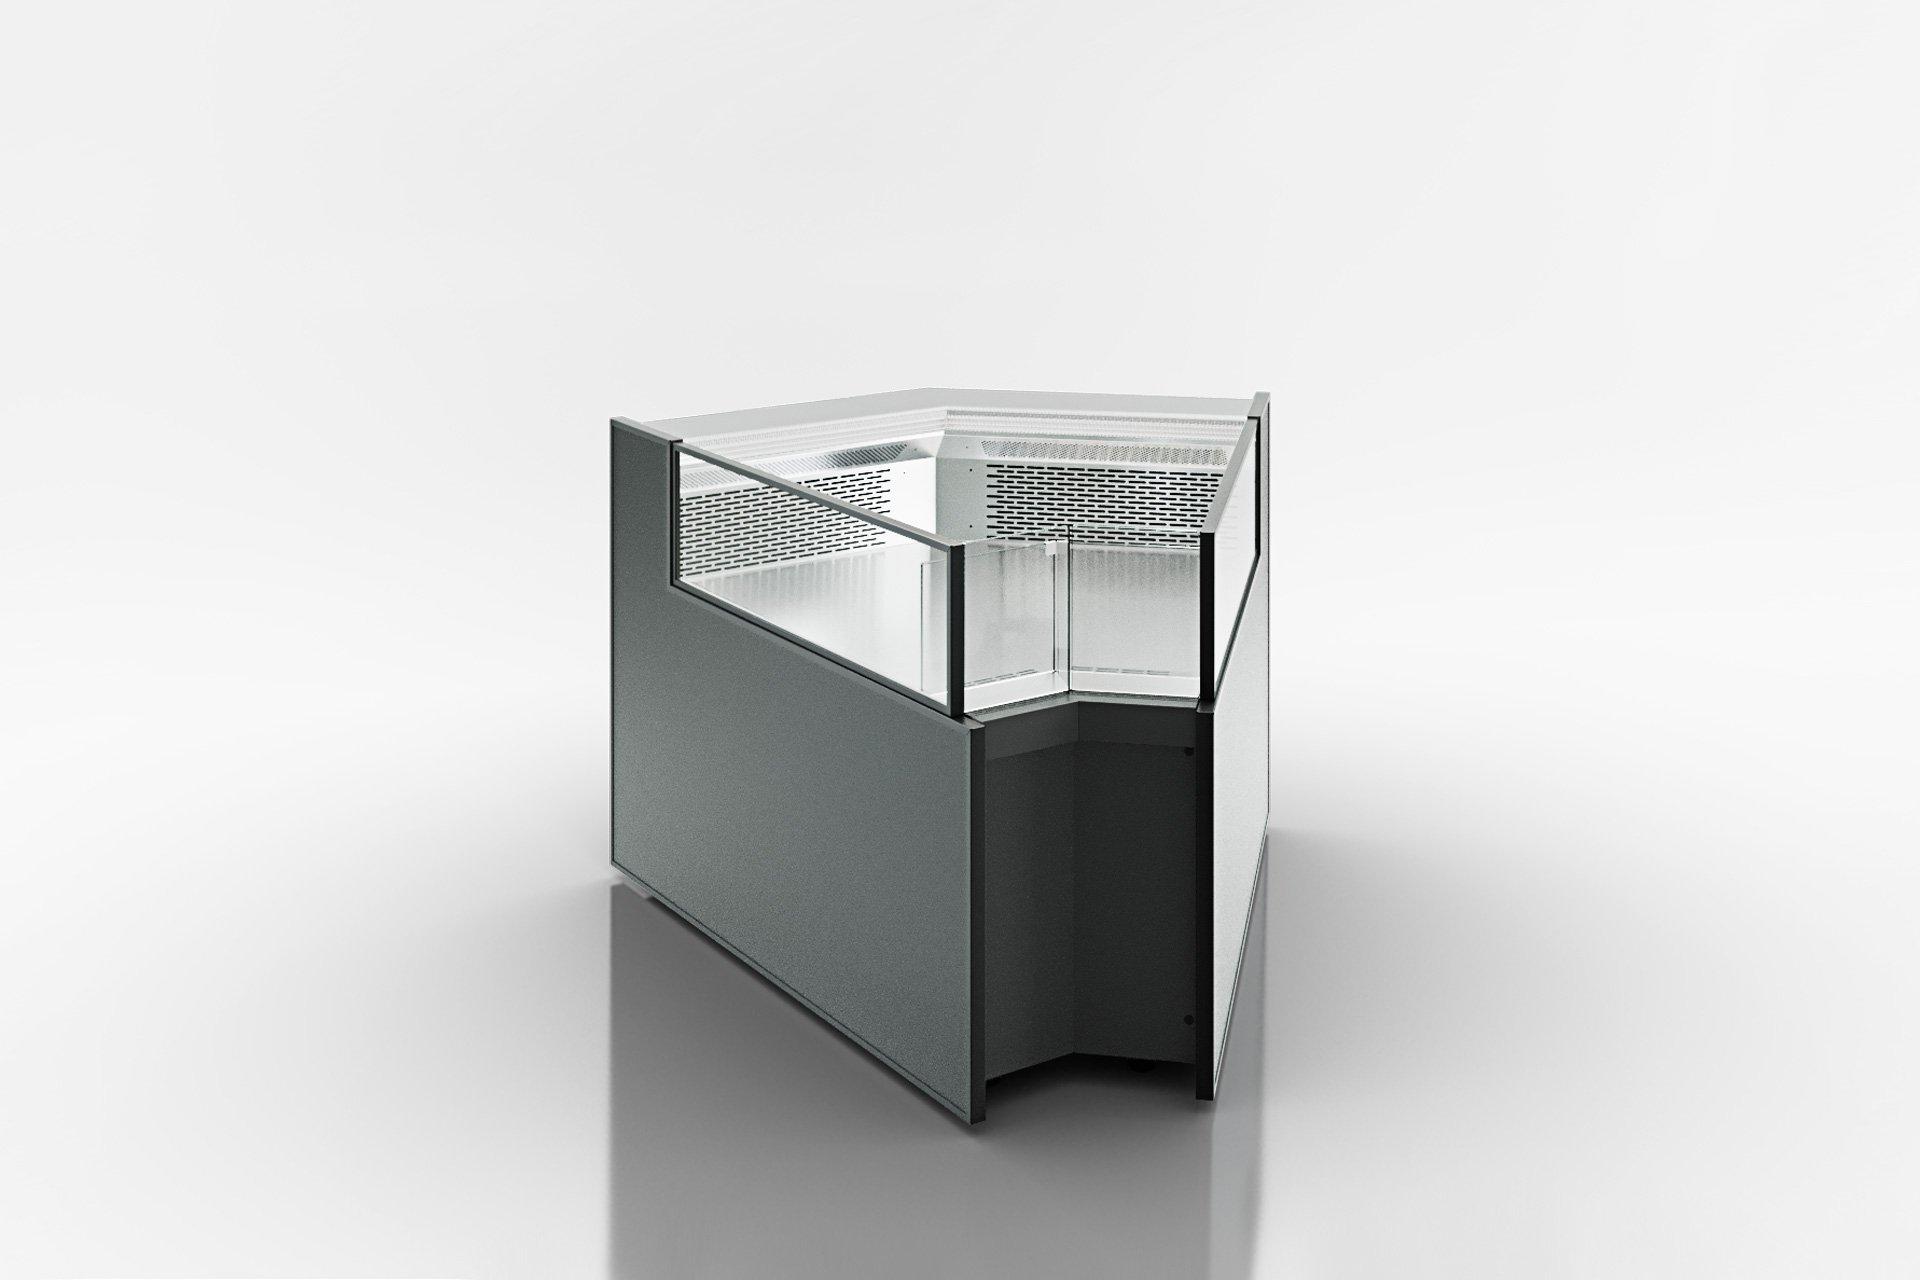 Angular elements of refrigerating counters Missouri MC 120 deli self 086-DLM-IS45